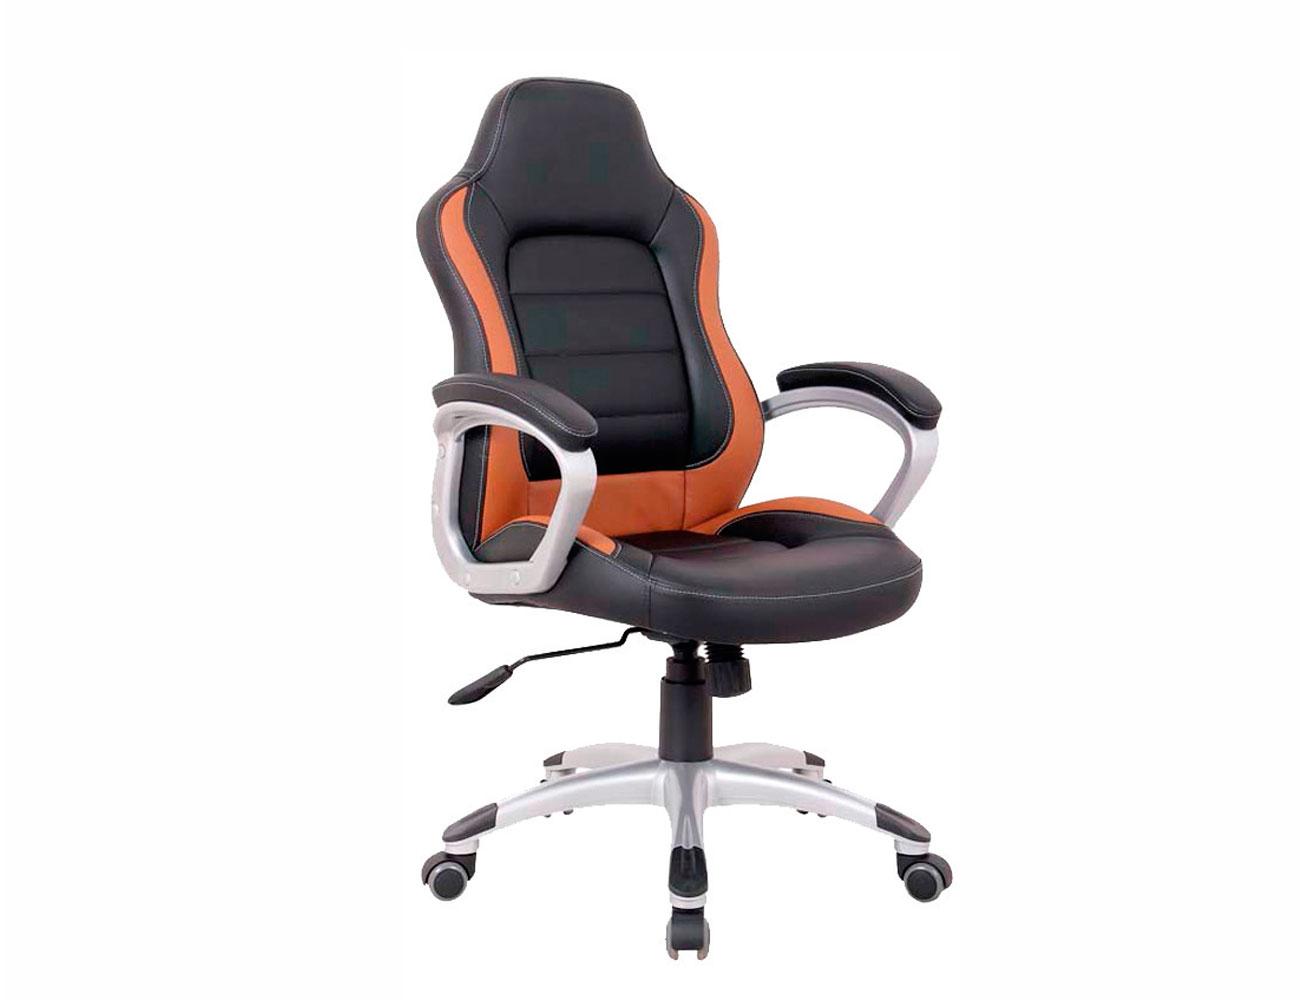 Silla oficina ergonomica polipiel brazos ruedas marron1